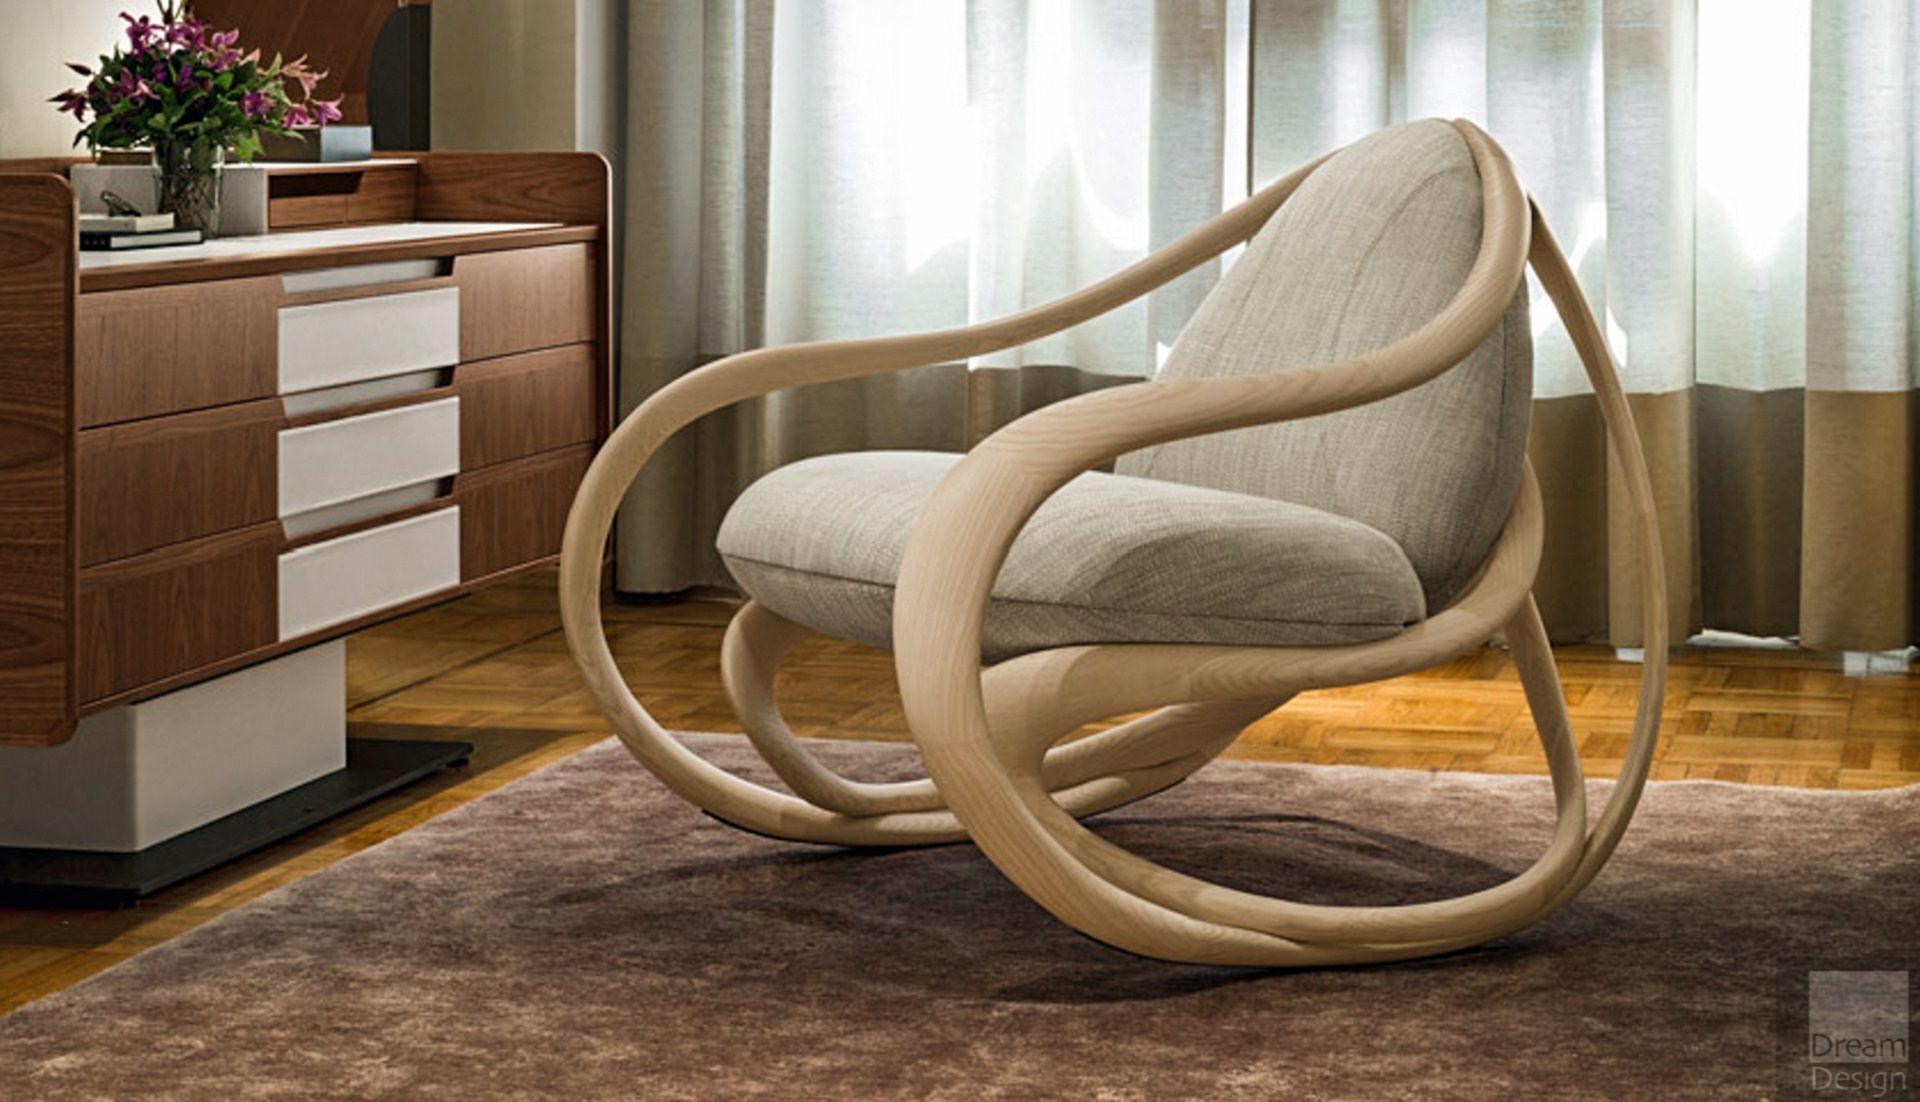 Move Rocking Chair Rocking chair, Interior